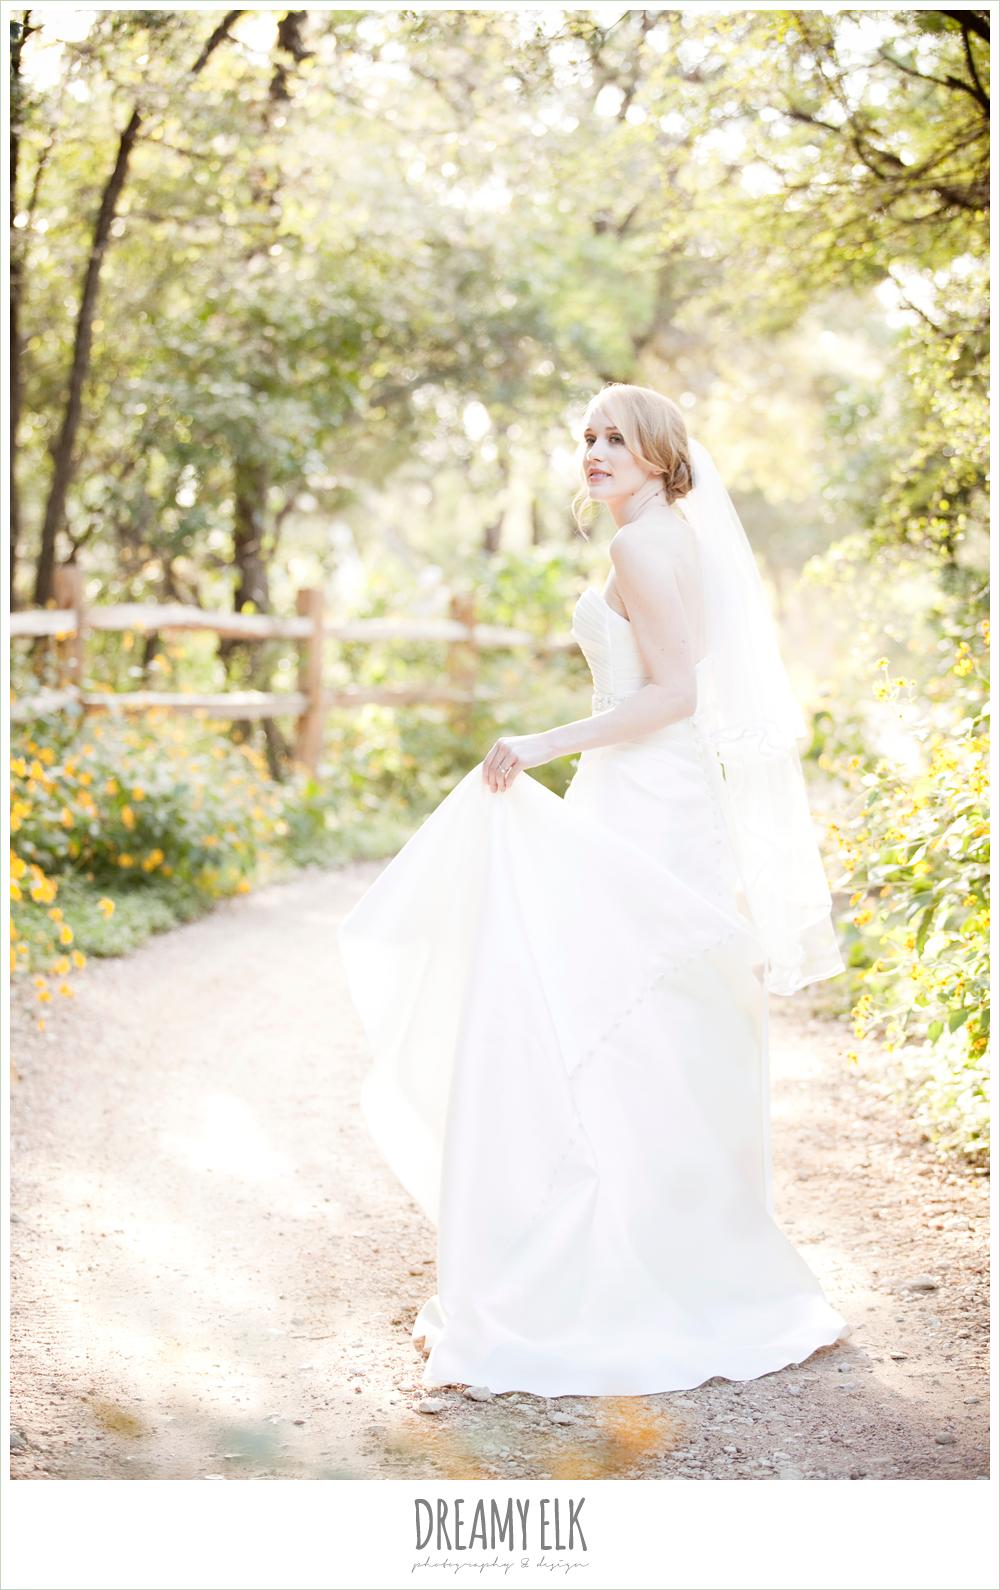 mallory, bridal photo contest, Zilker botanical garden